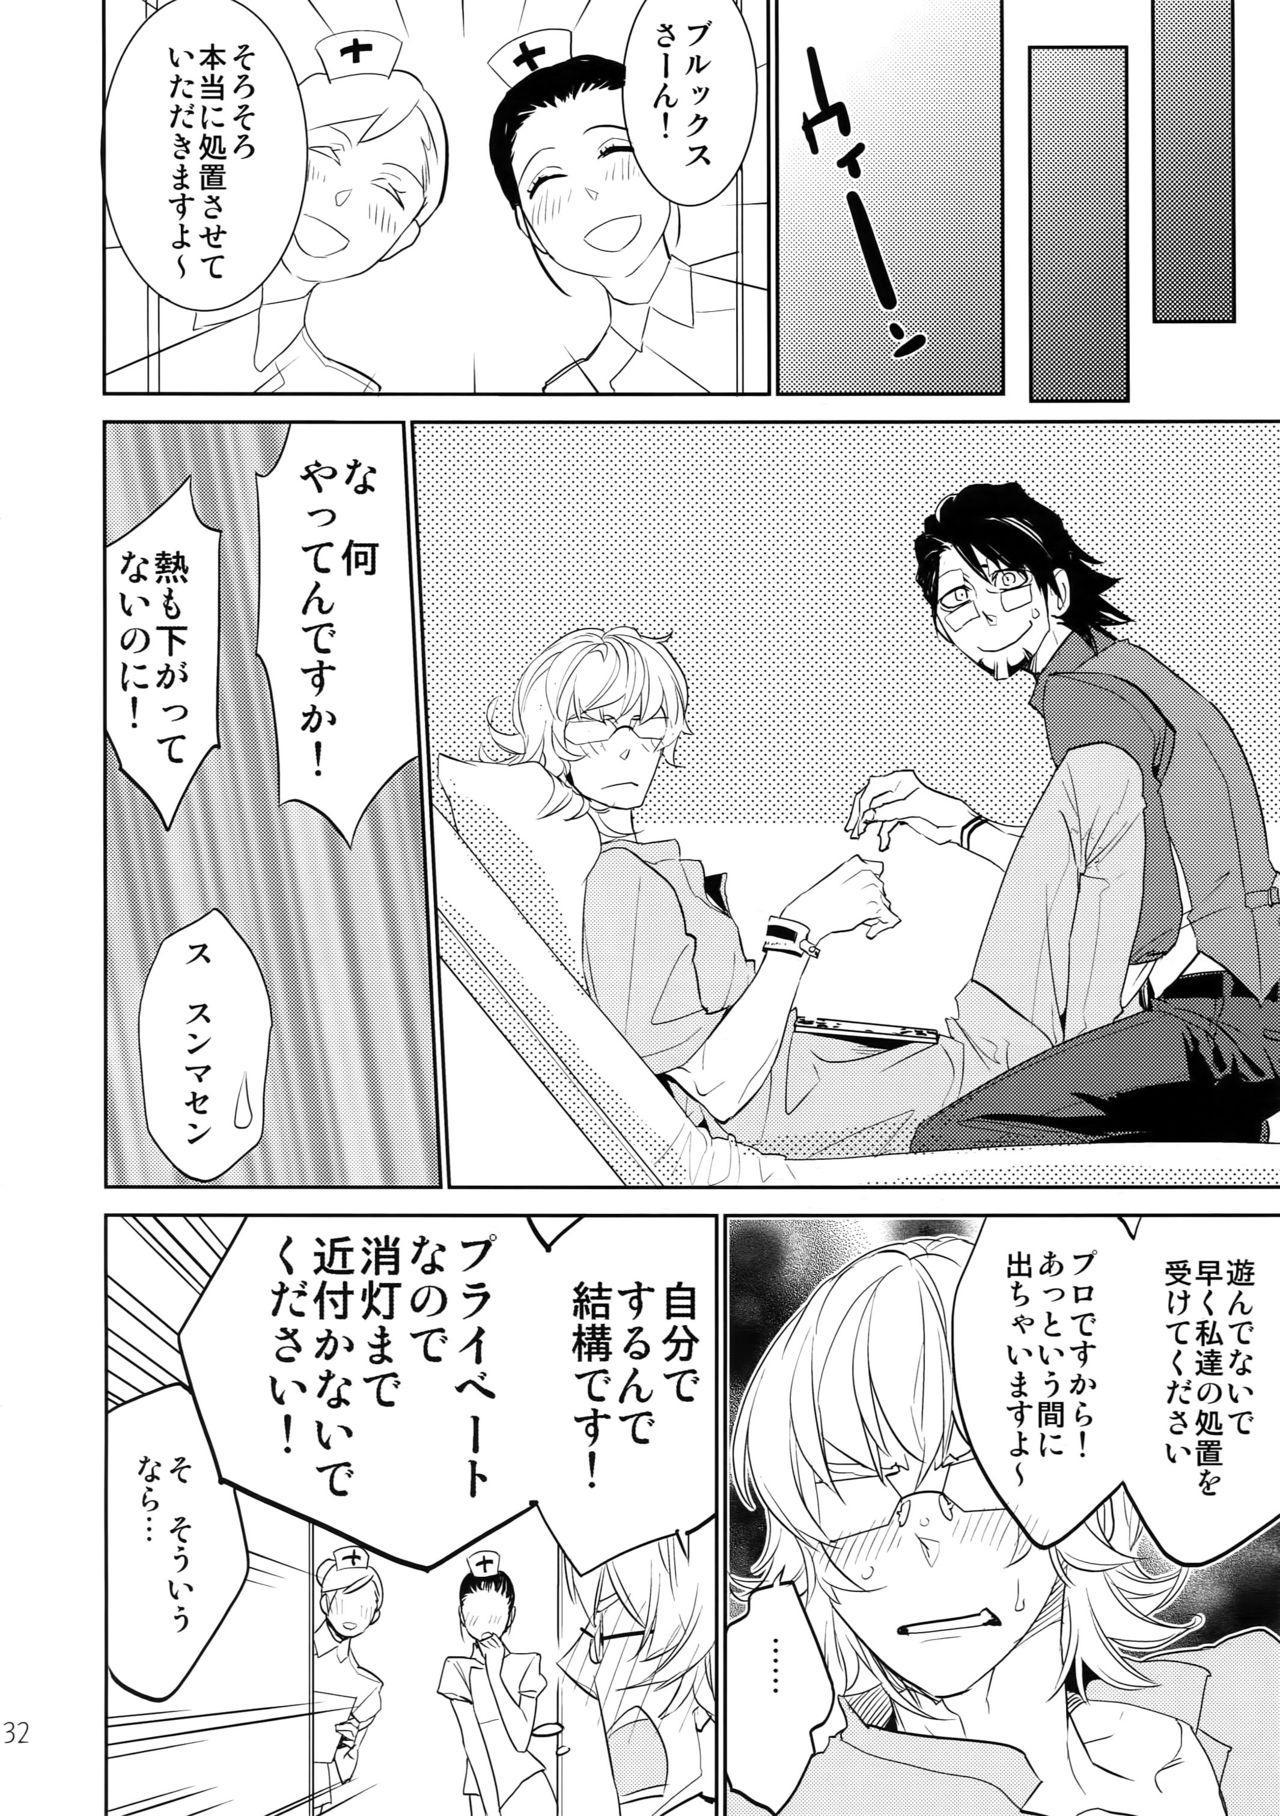 T&B Sairoku! 2 30